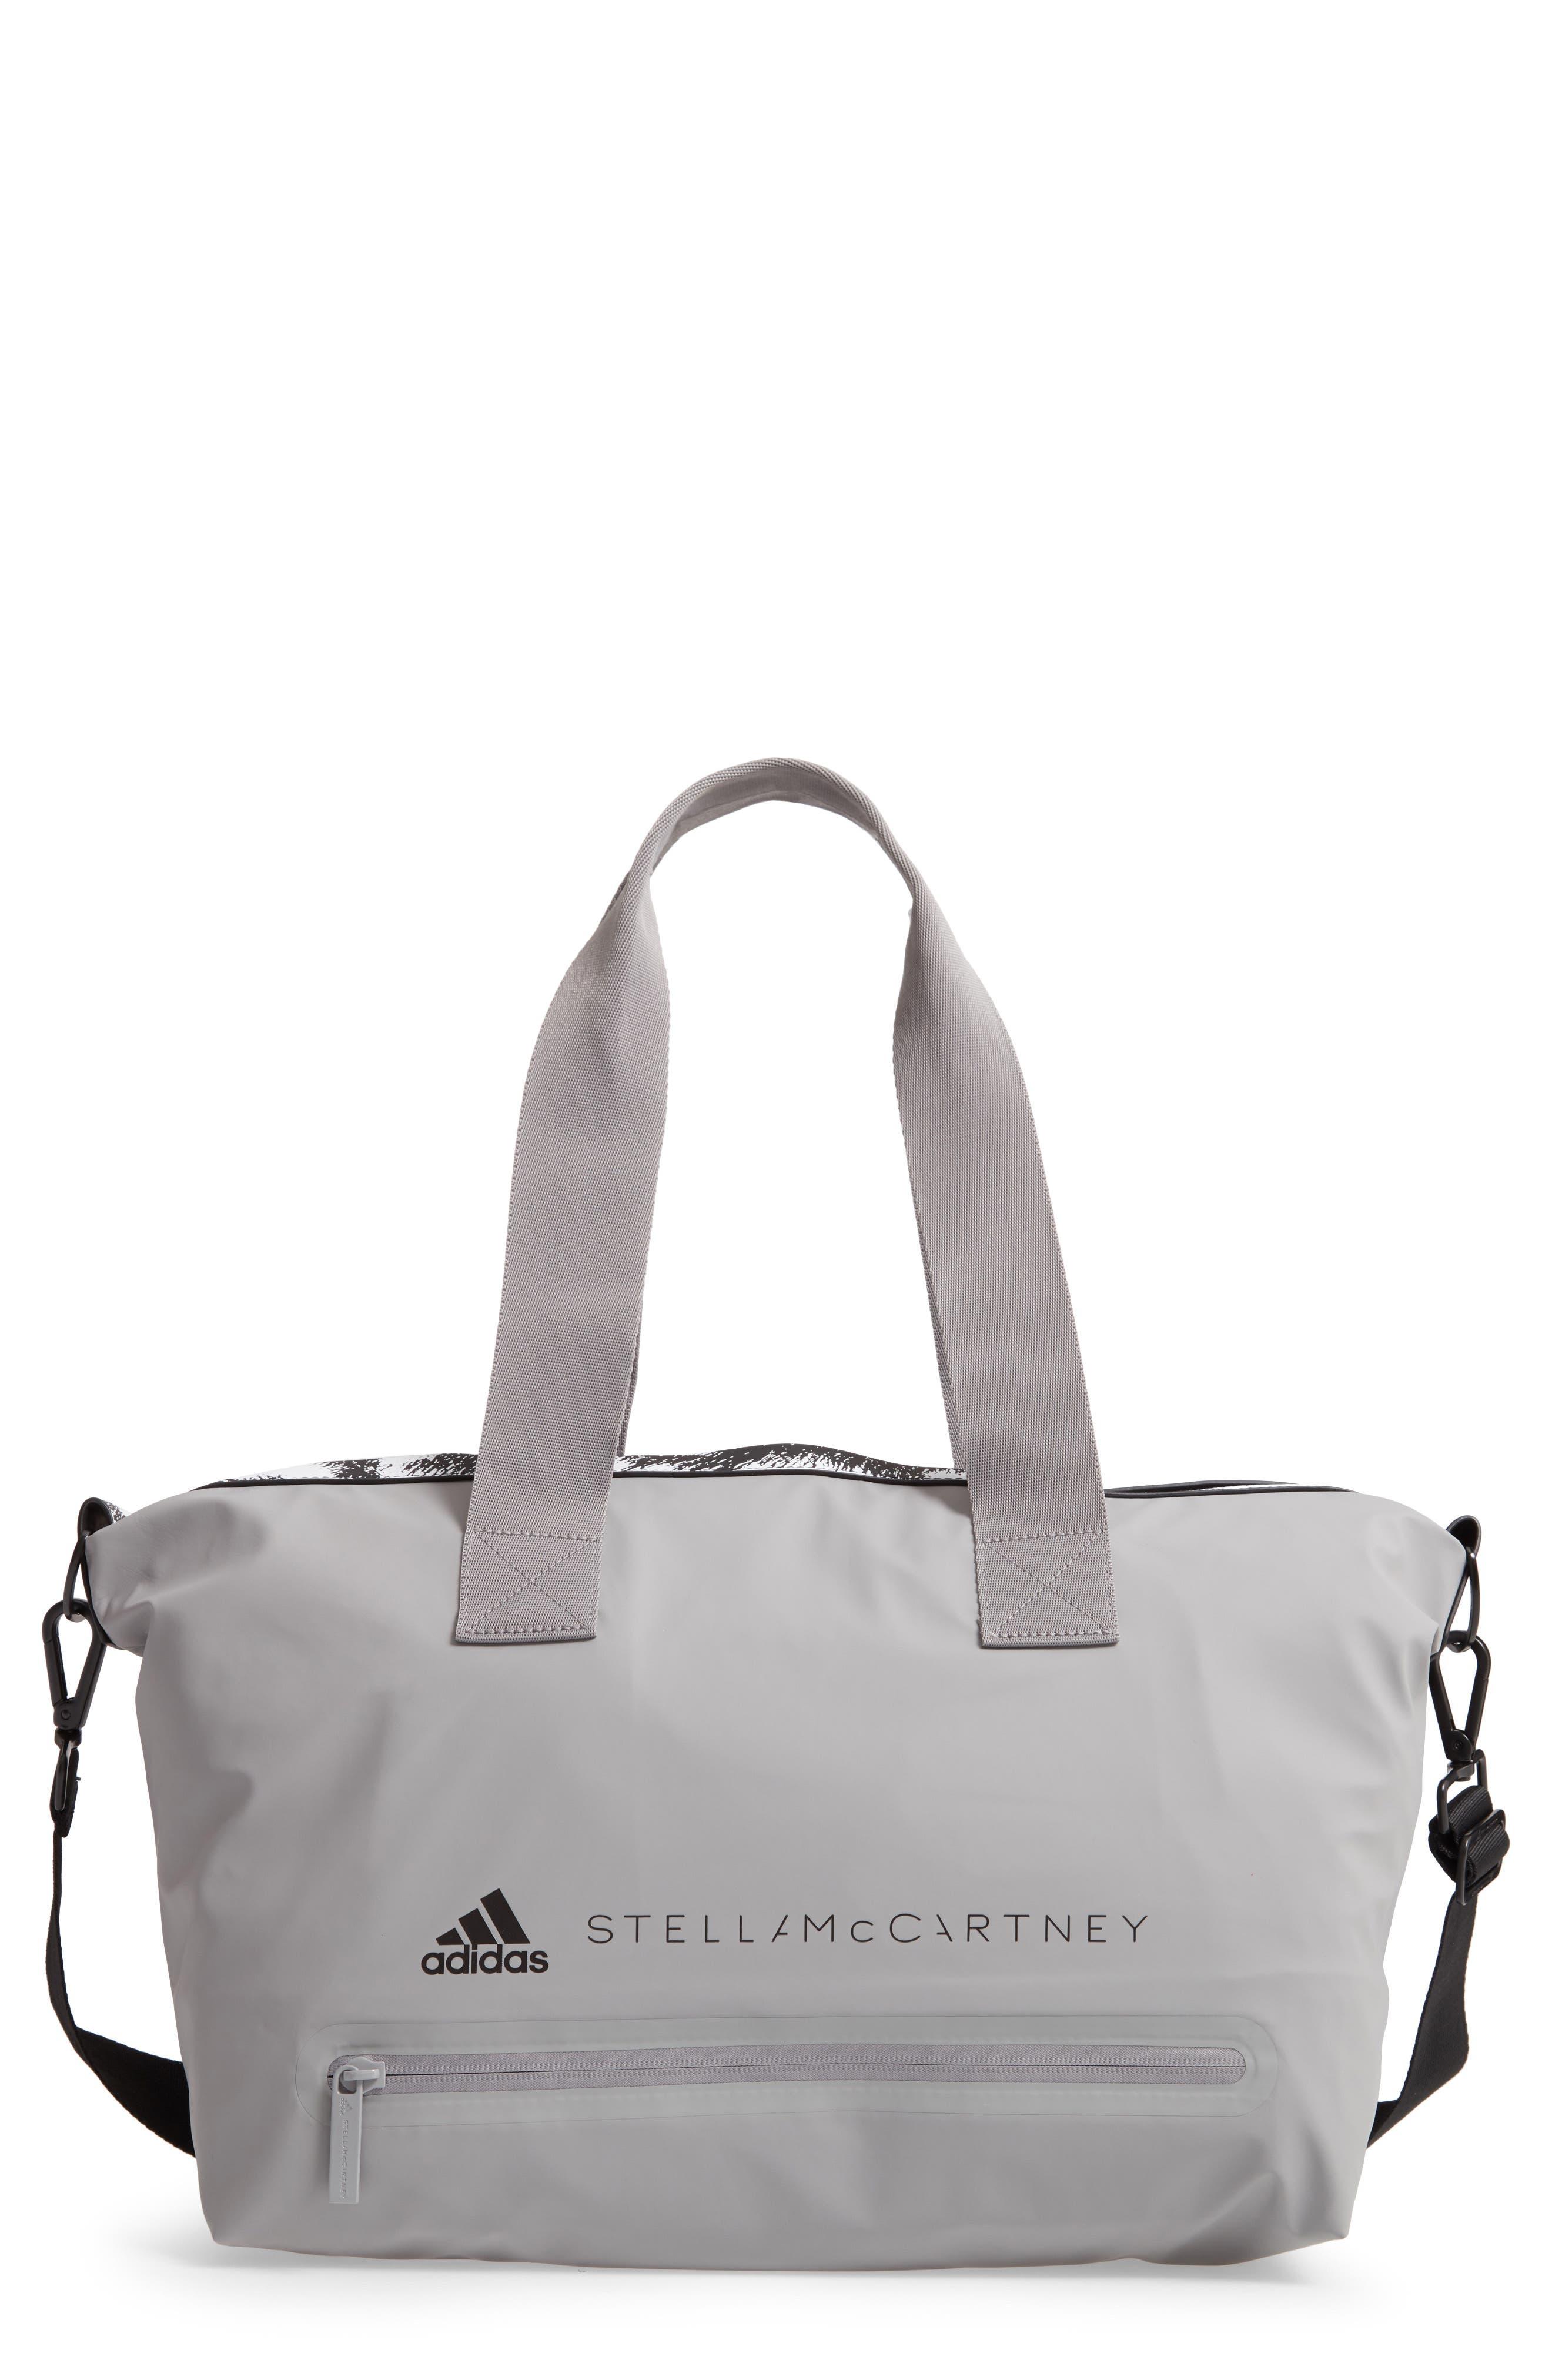 ADIDAS BY STELLA MCCARTNEY Small Studio Bag, Main, color, 020